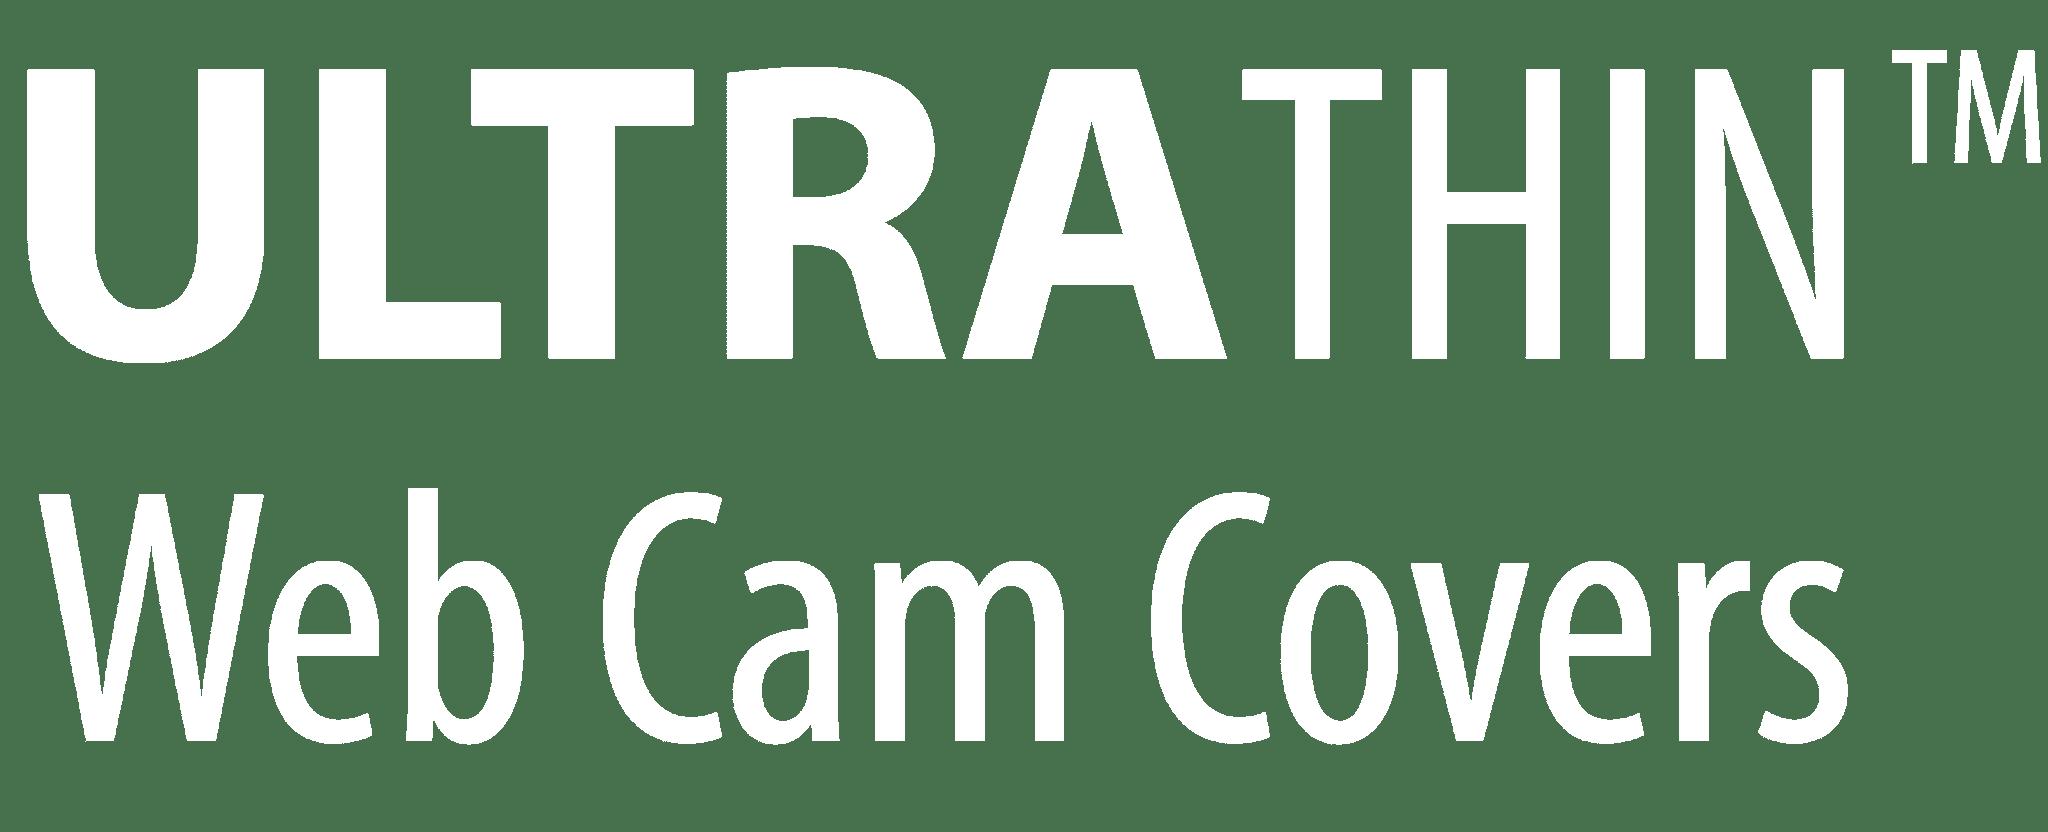 Ultra Thin Webcam Covers Logo